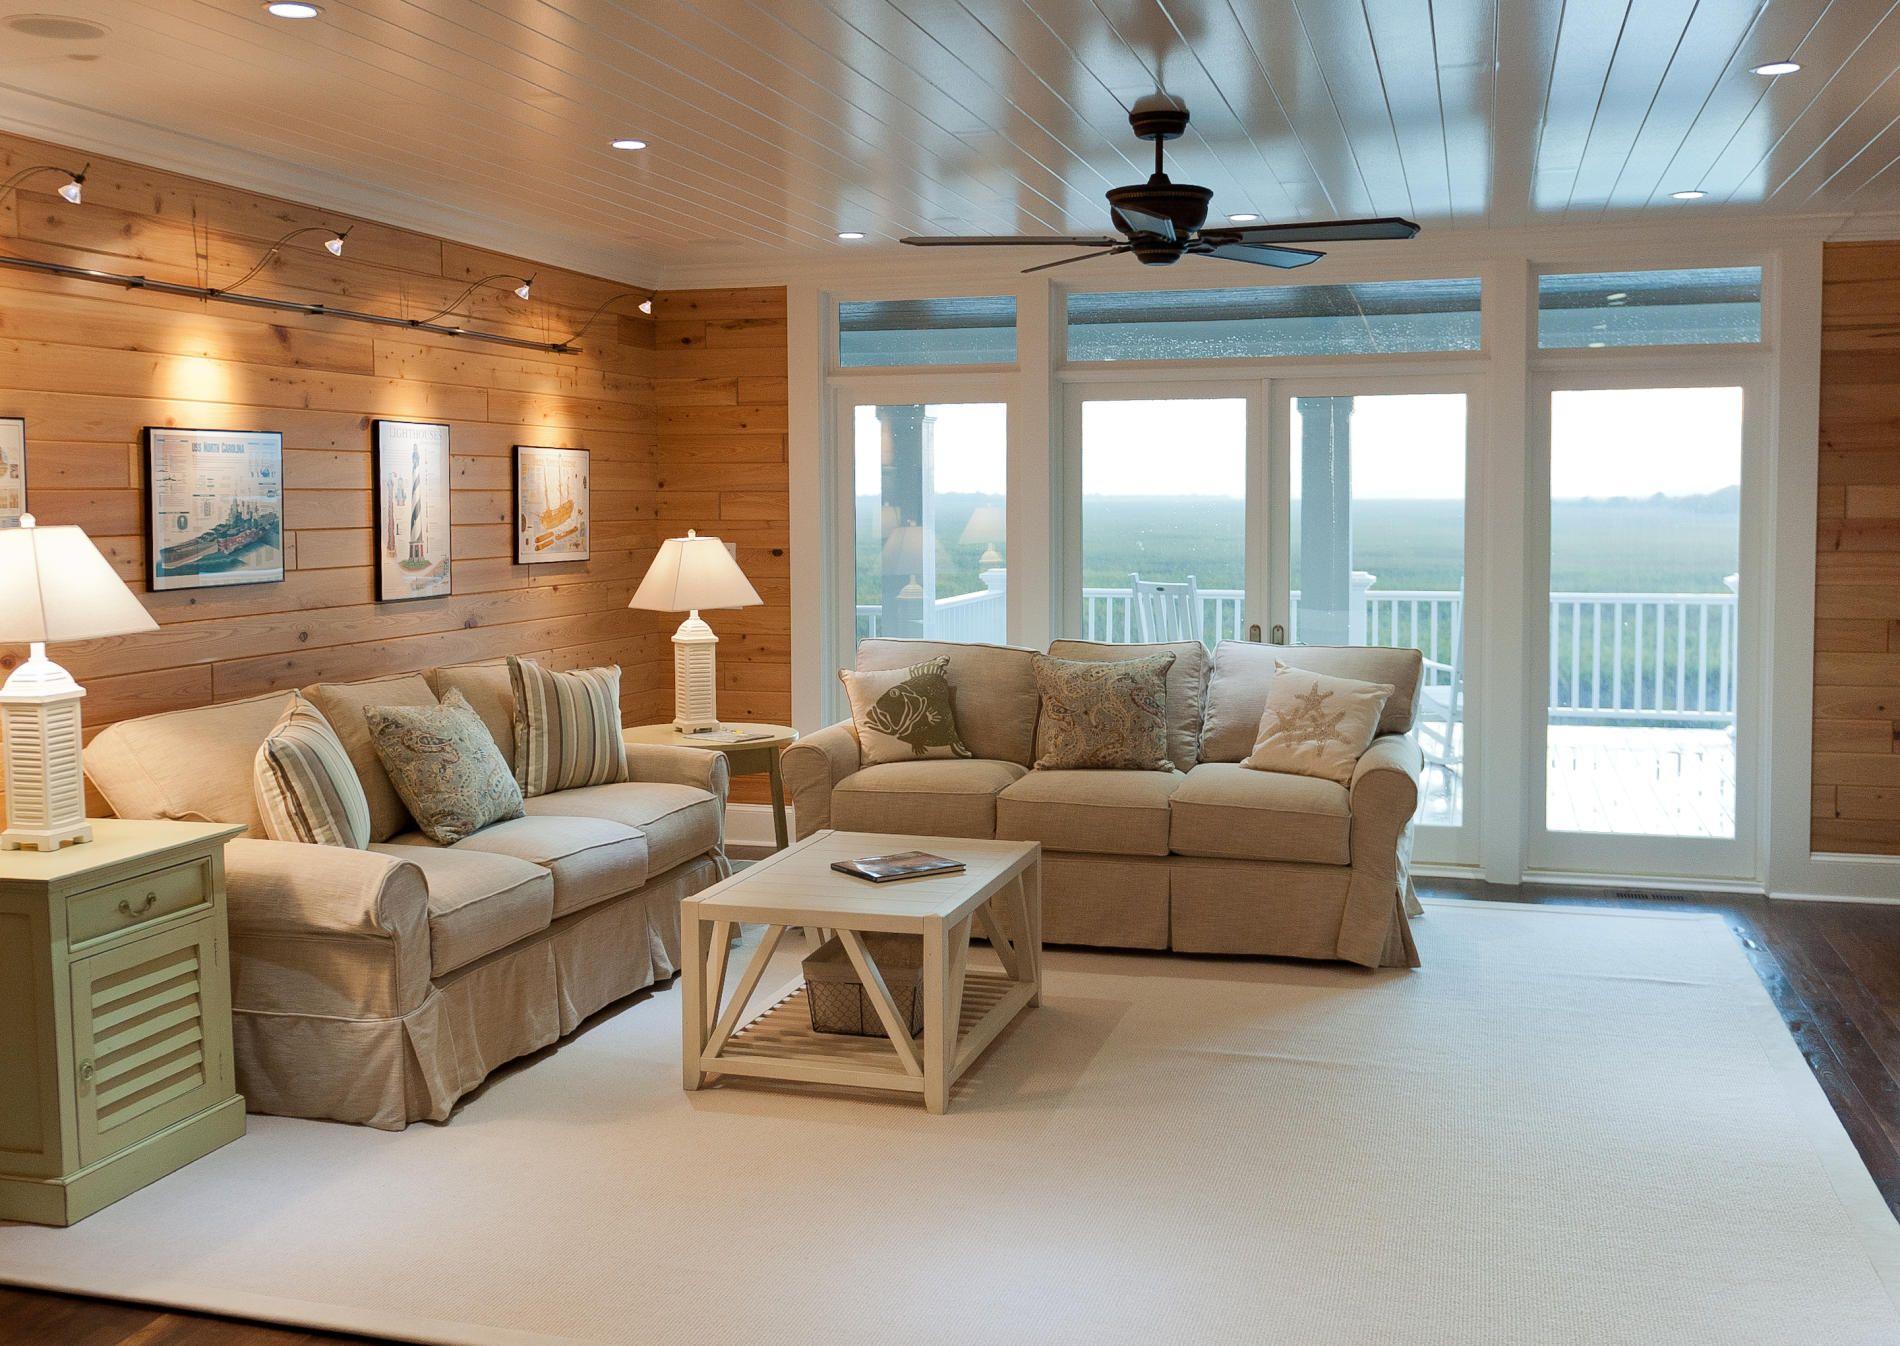 Wood Design For Living Room Wooden Living Room Wooden Living Room Wall Units Aphia2 1000